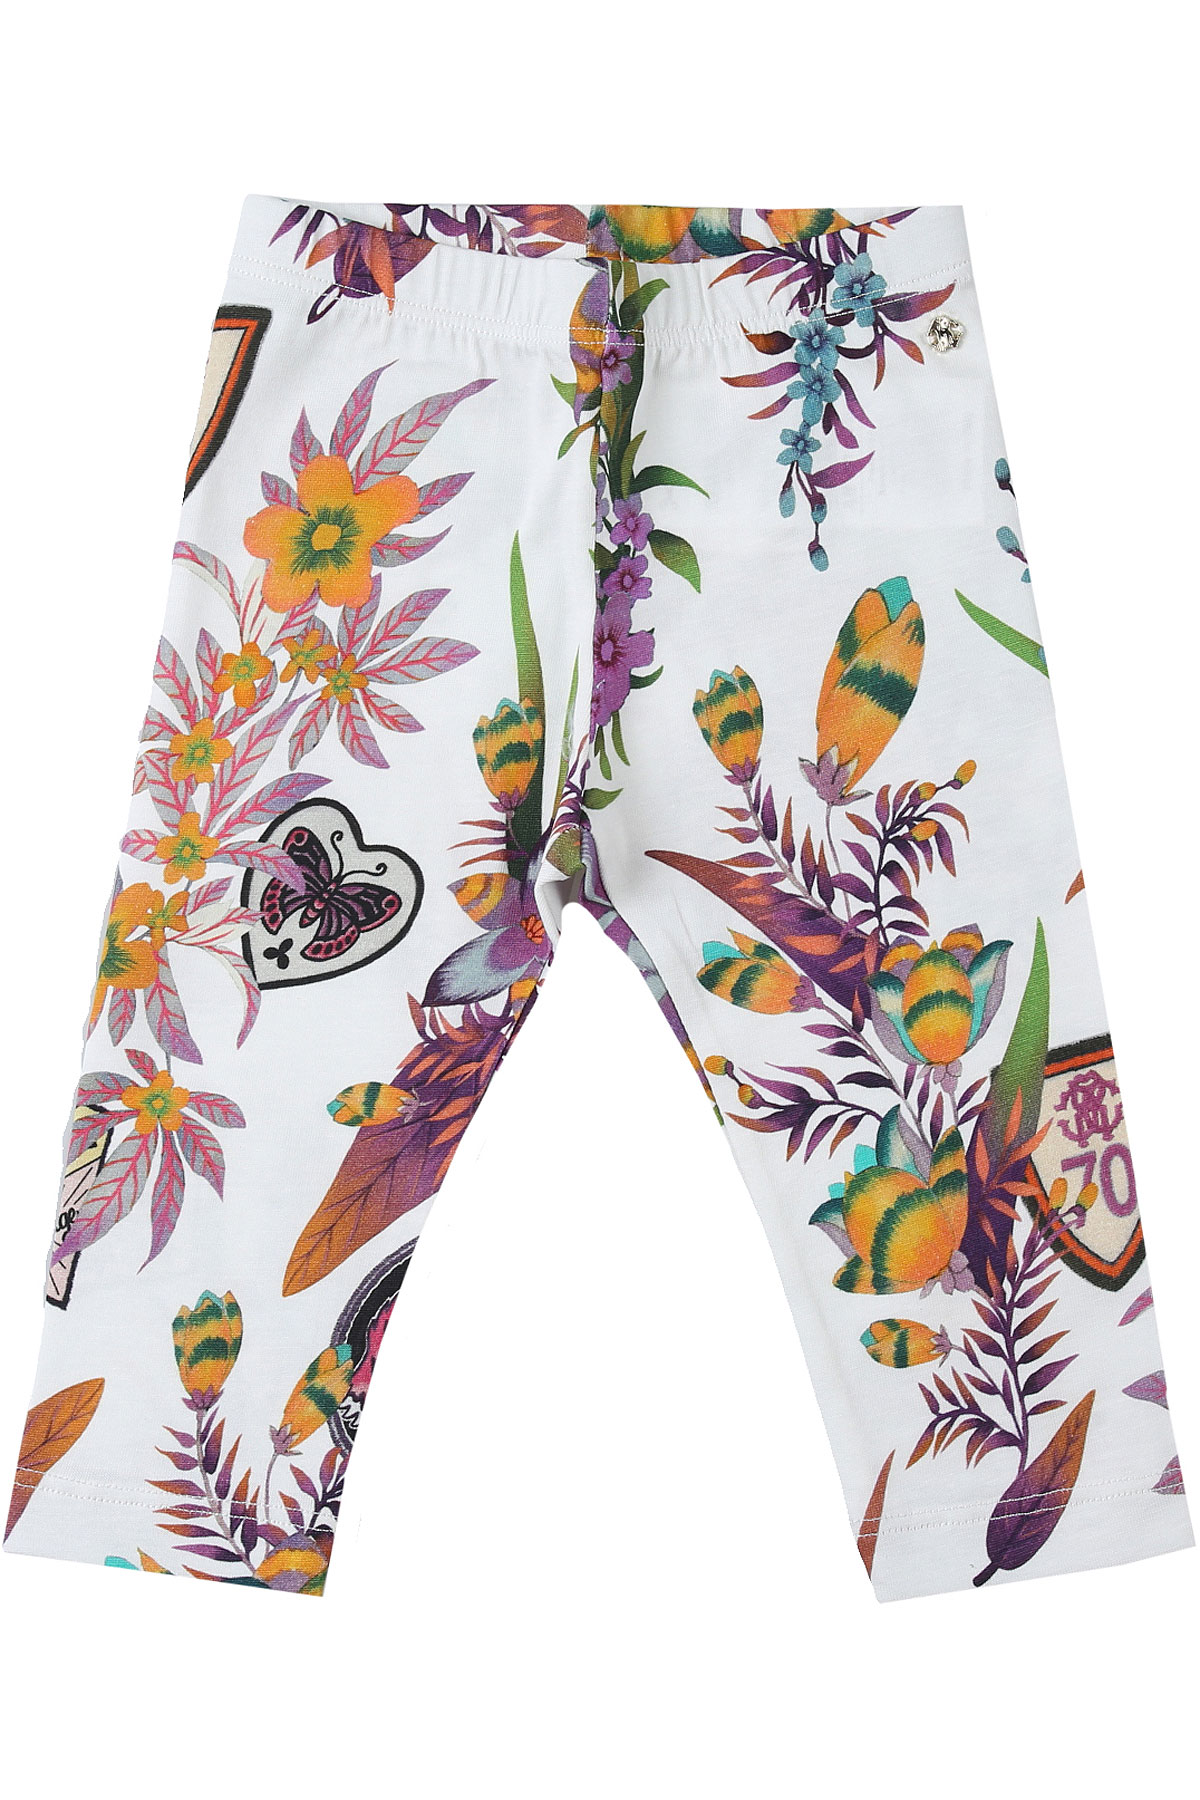 Roberto Cavalli Baby Pants for Girls On Sale, Cream, Cotton, 2019, 12M 18M 2Y 3Y